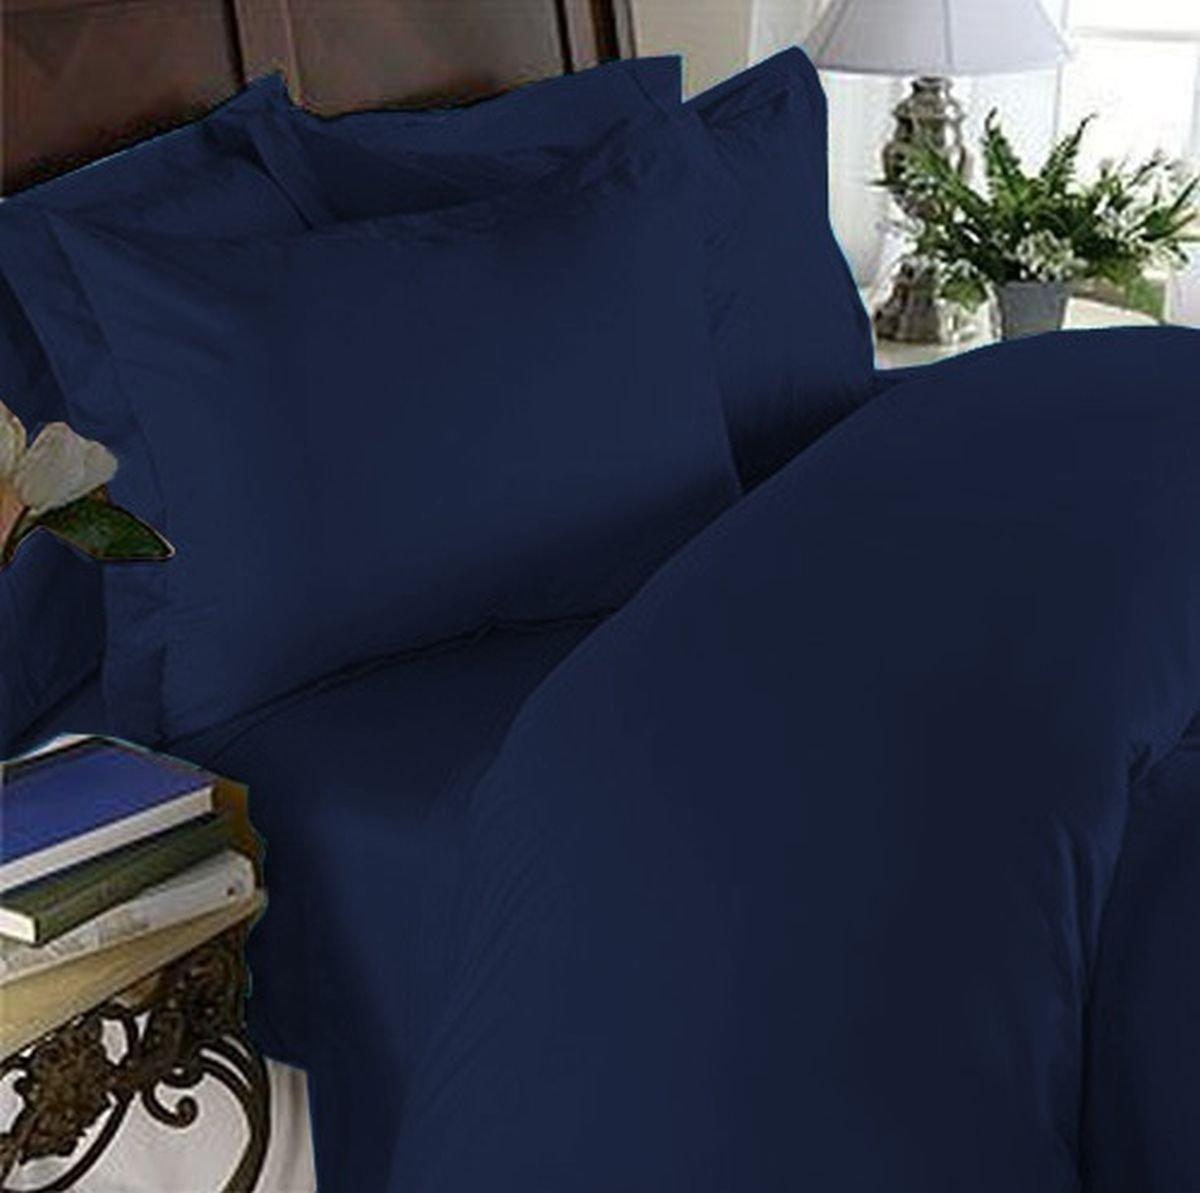 Elegant Comfort Luxurious Wrinkle-Free & Fade Resistant Microfiber Duvet Cover Collection, Navy Blue, 3-Piece Set